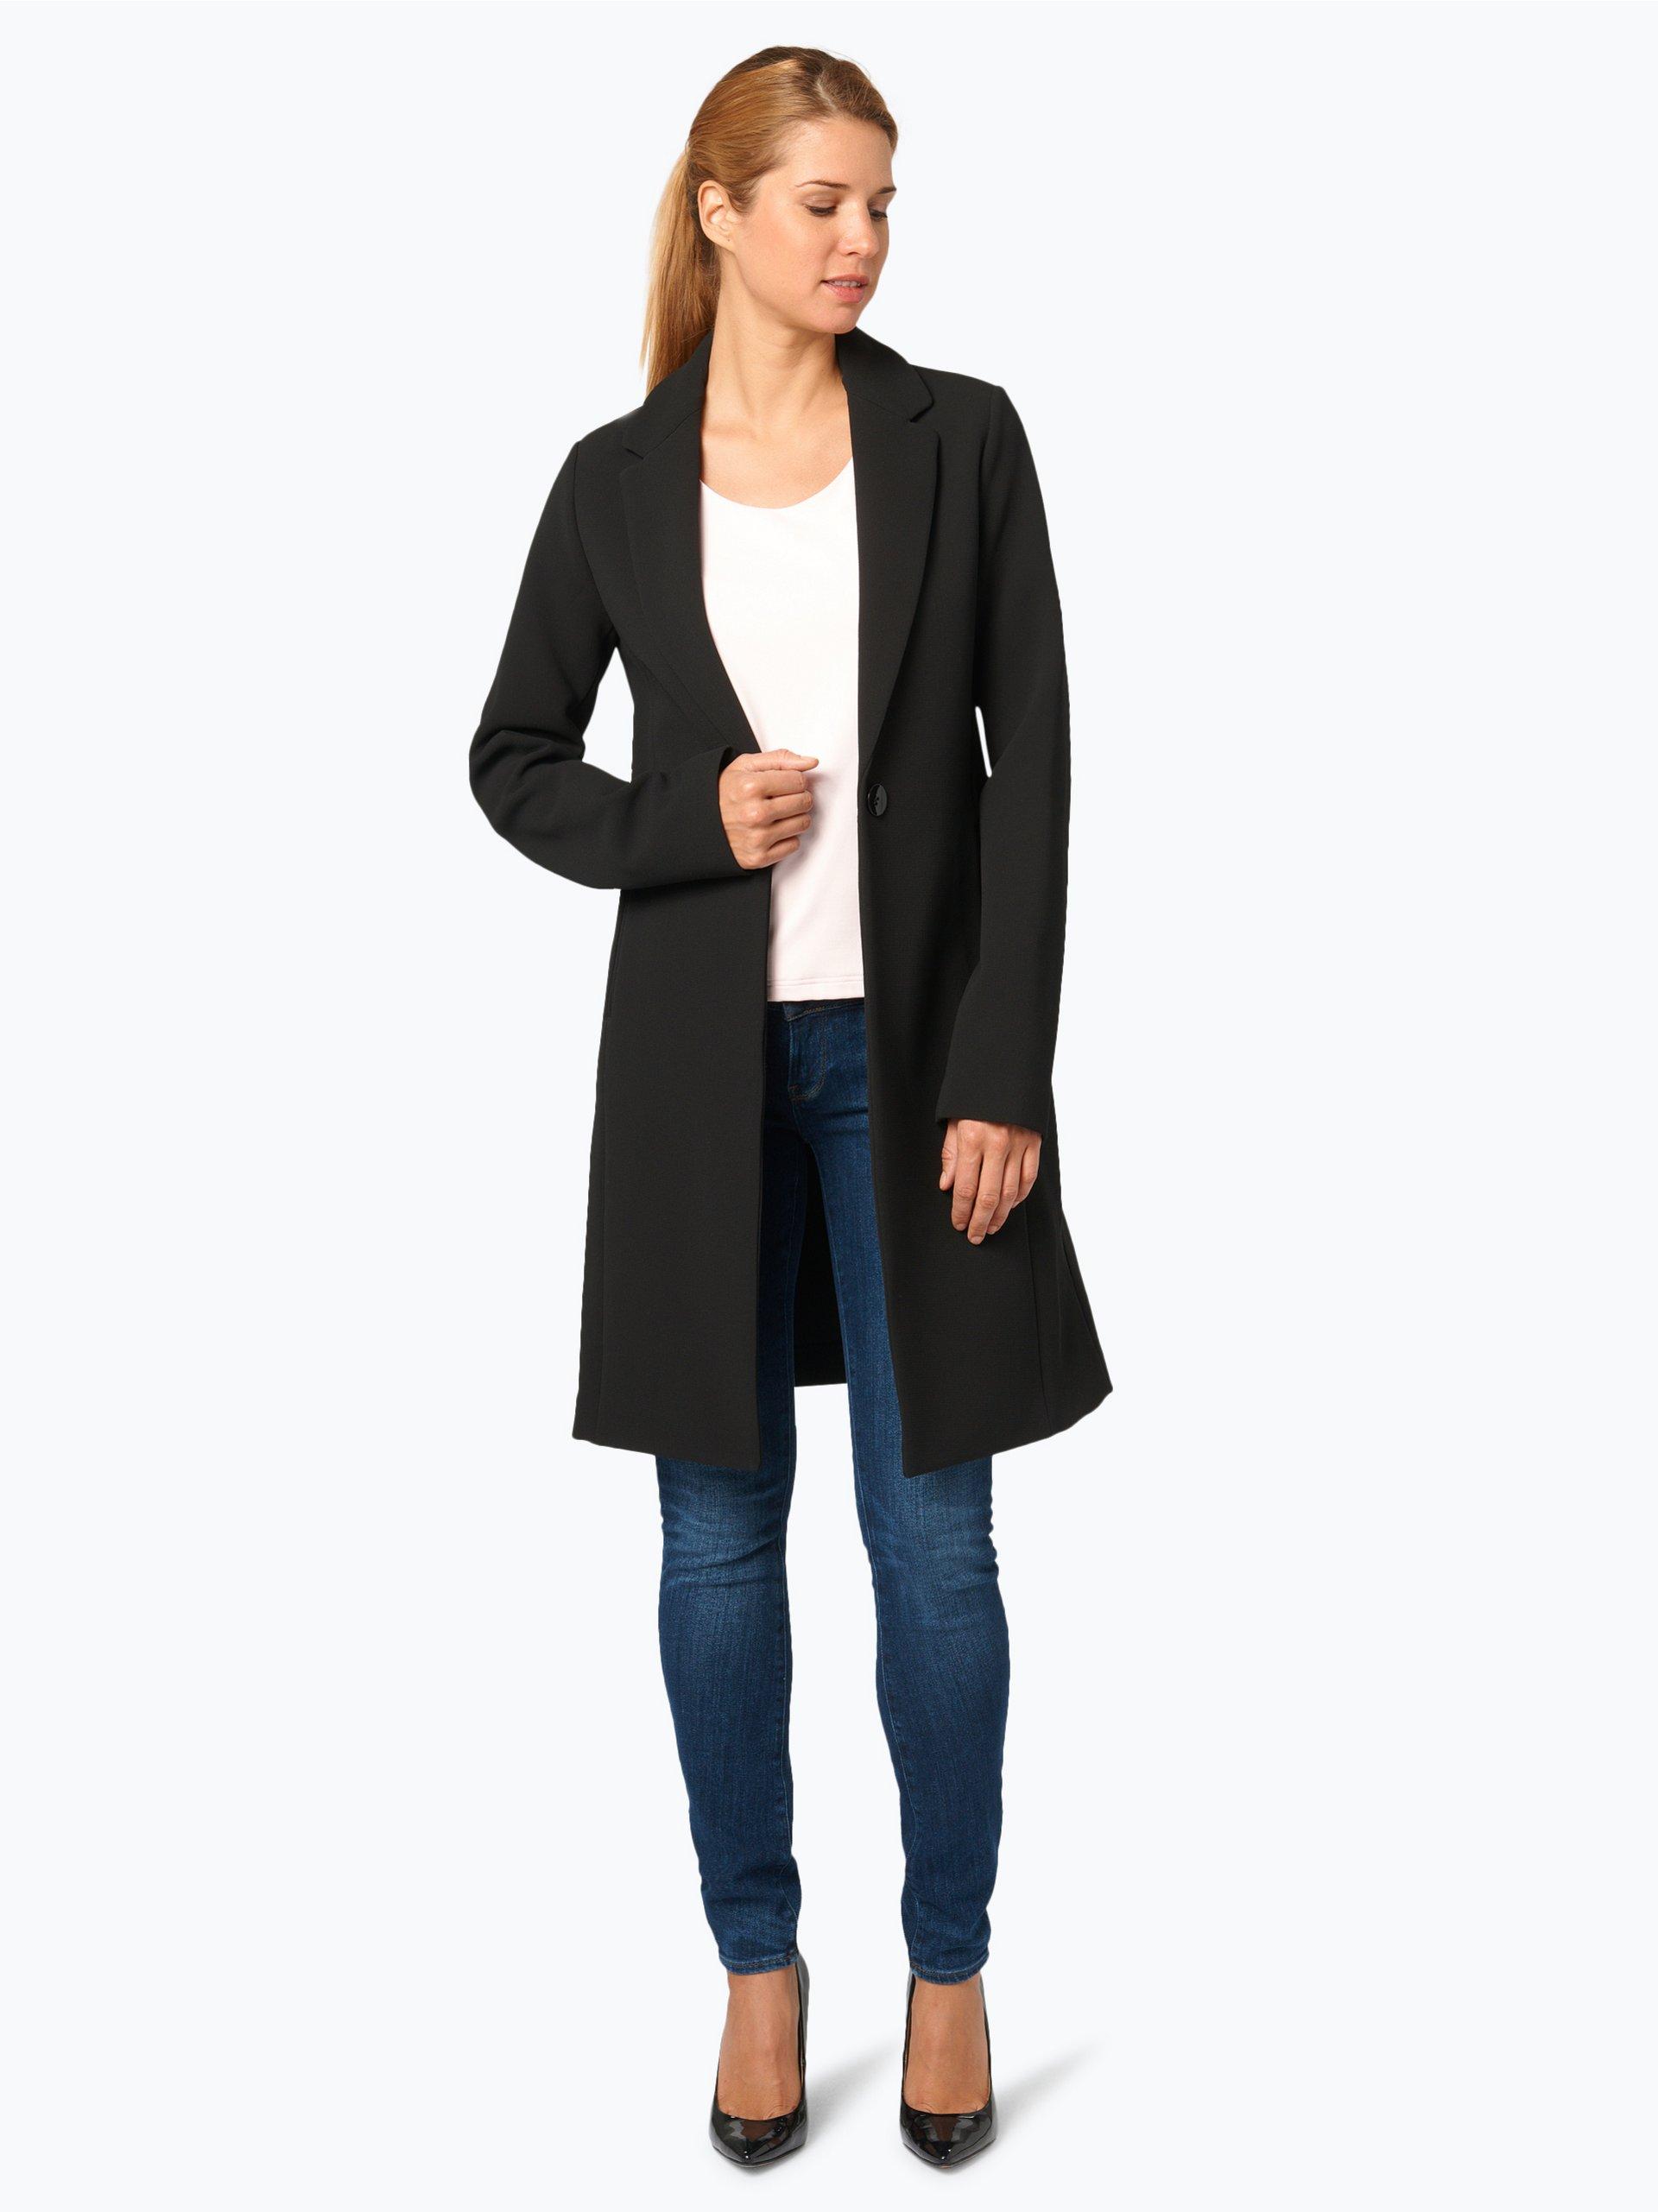 guess jeans damen mantel schwarz uni online kaufen. Black Bedroom Furniture Sets. Home Design Ideas